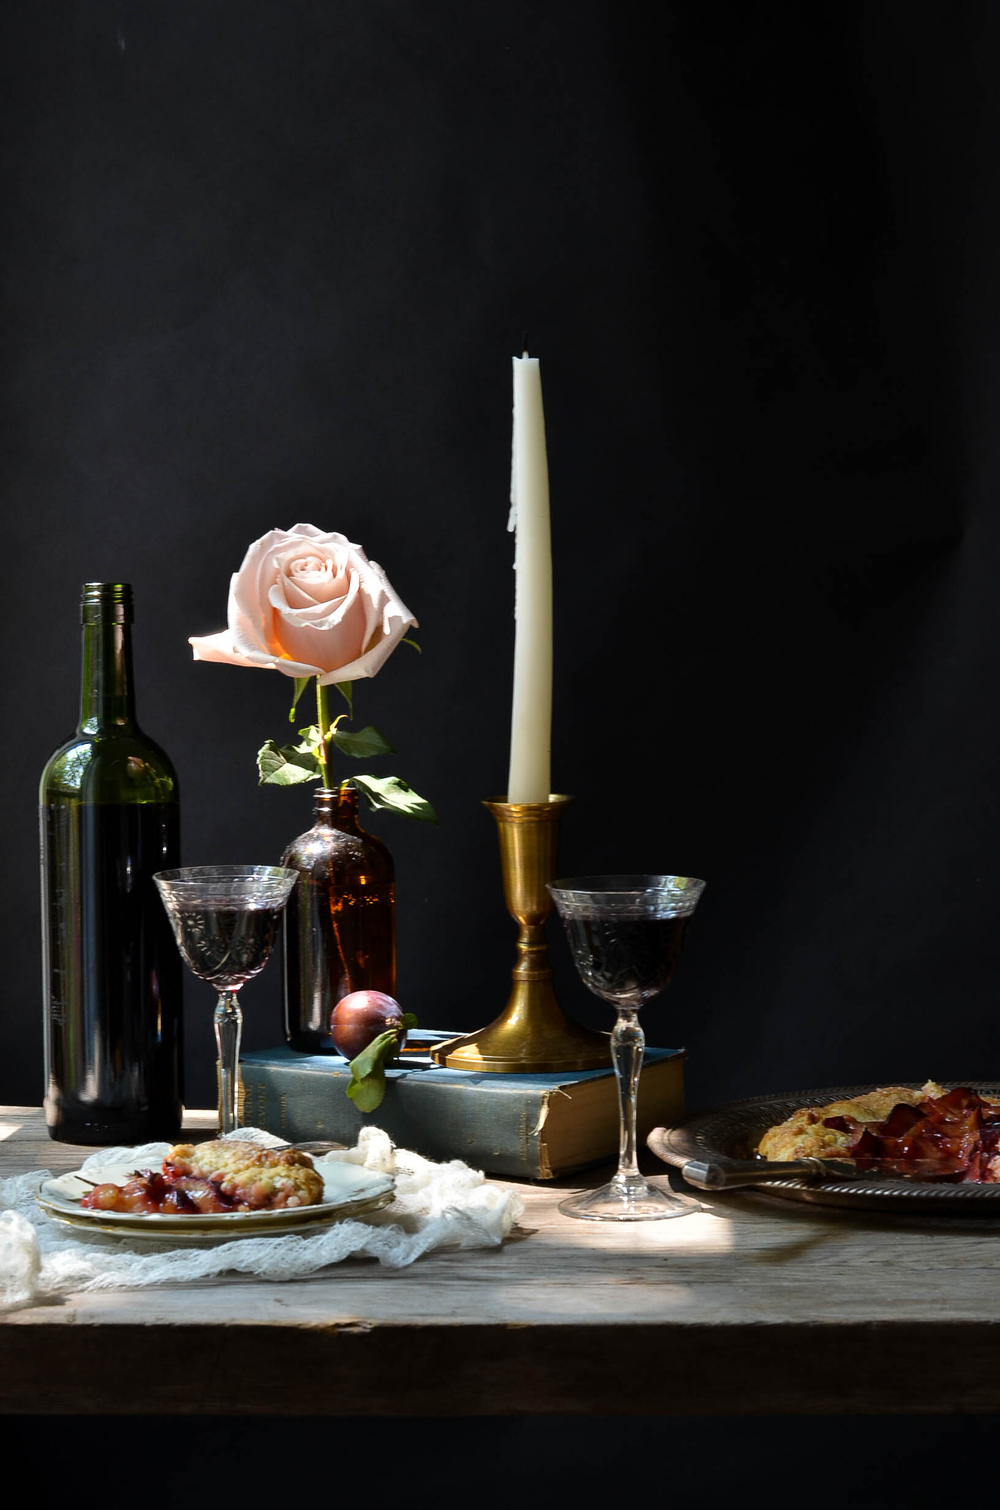 ROSE & IVY JORNAL PLUM & ROSE TART